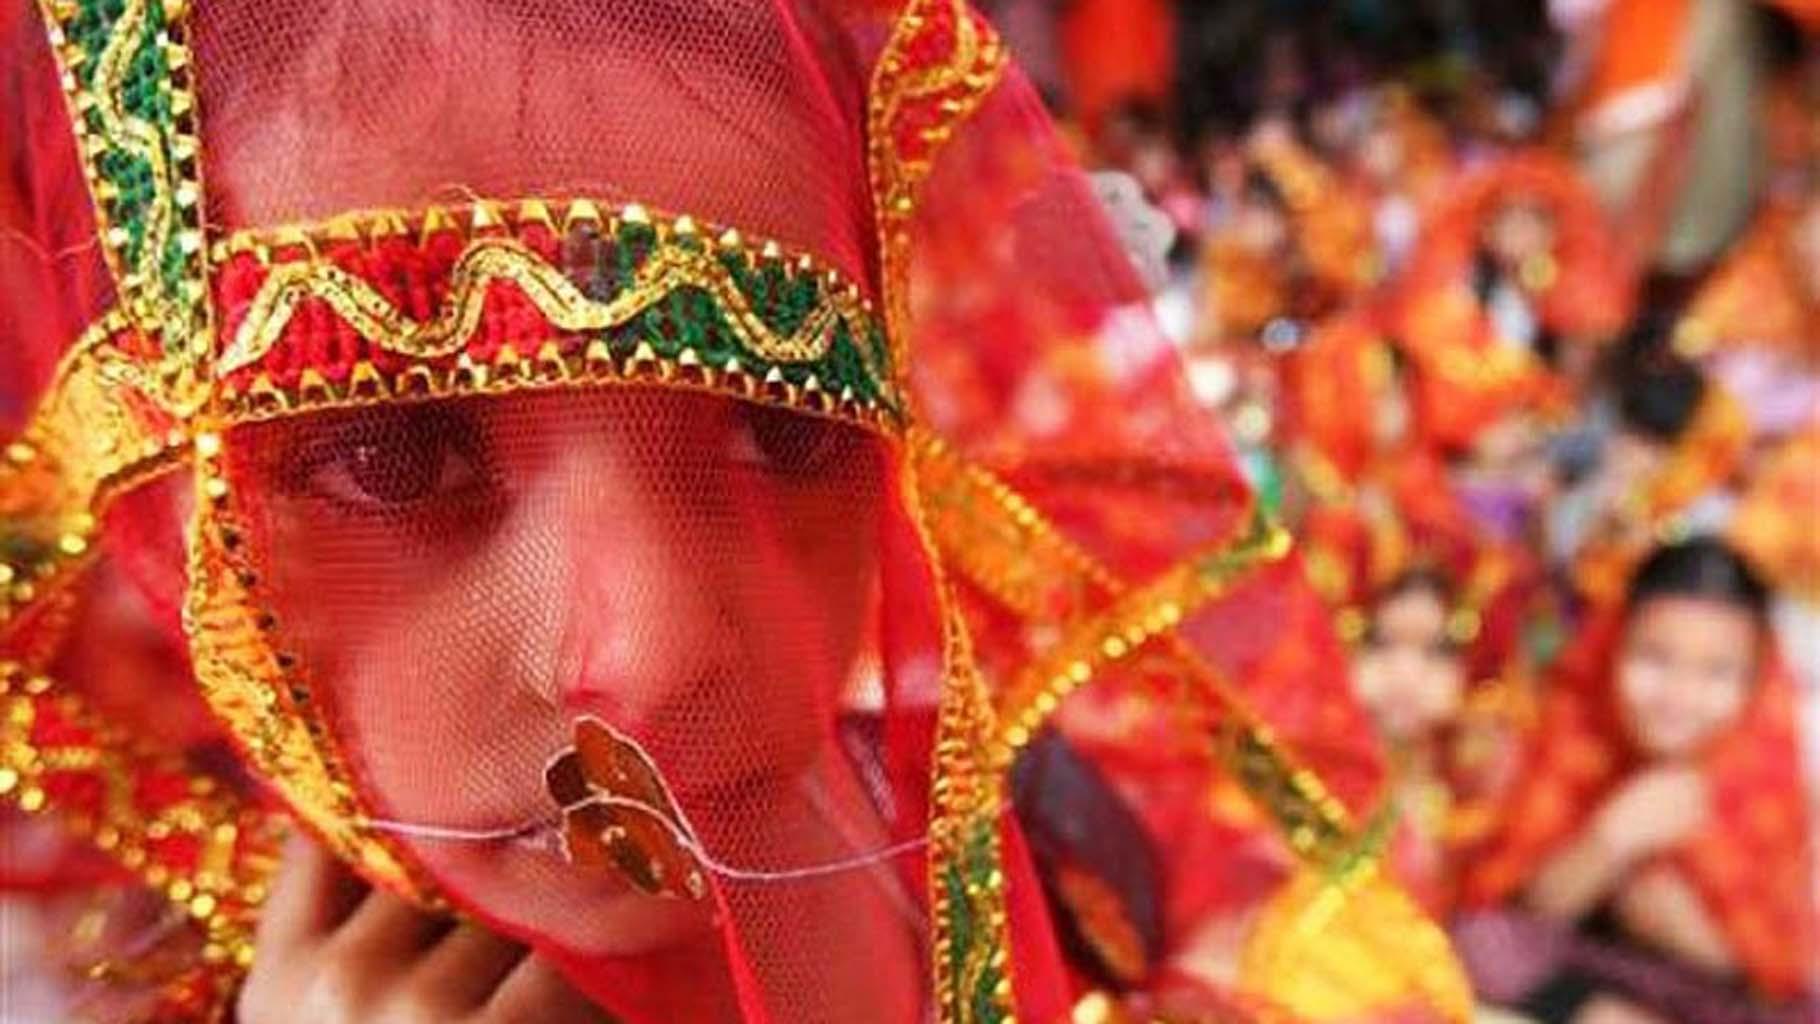 Covid-19 pandemic, Human Trafficking, Child bride, Childmarriage